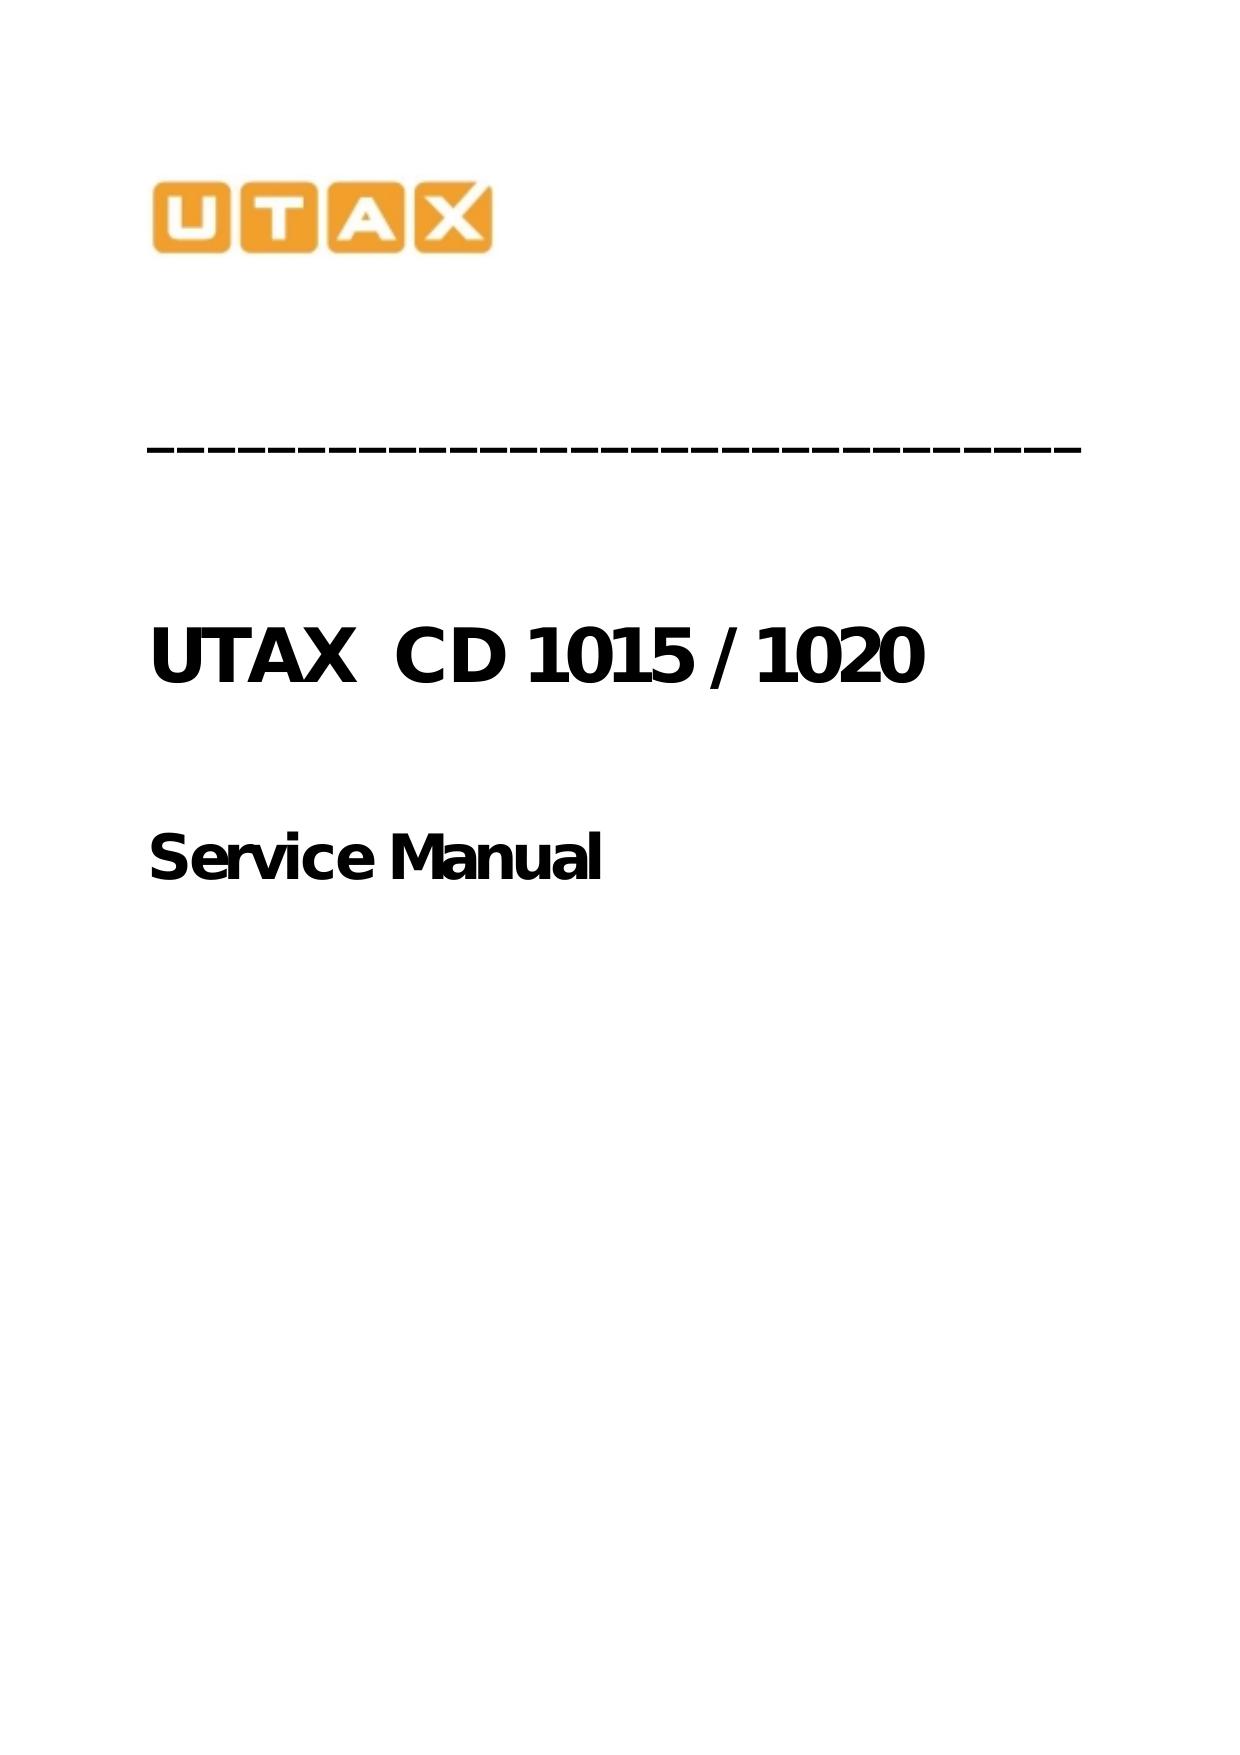 Utax CD 1015 Service manual | manualzz com